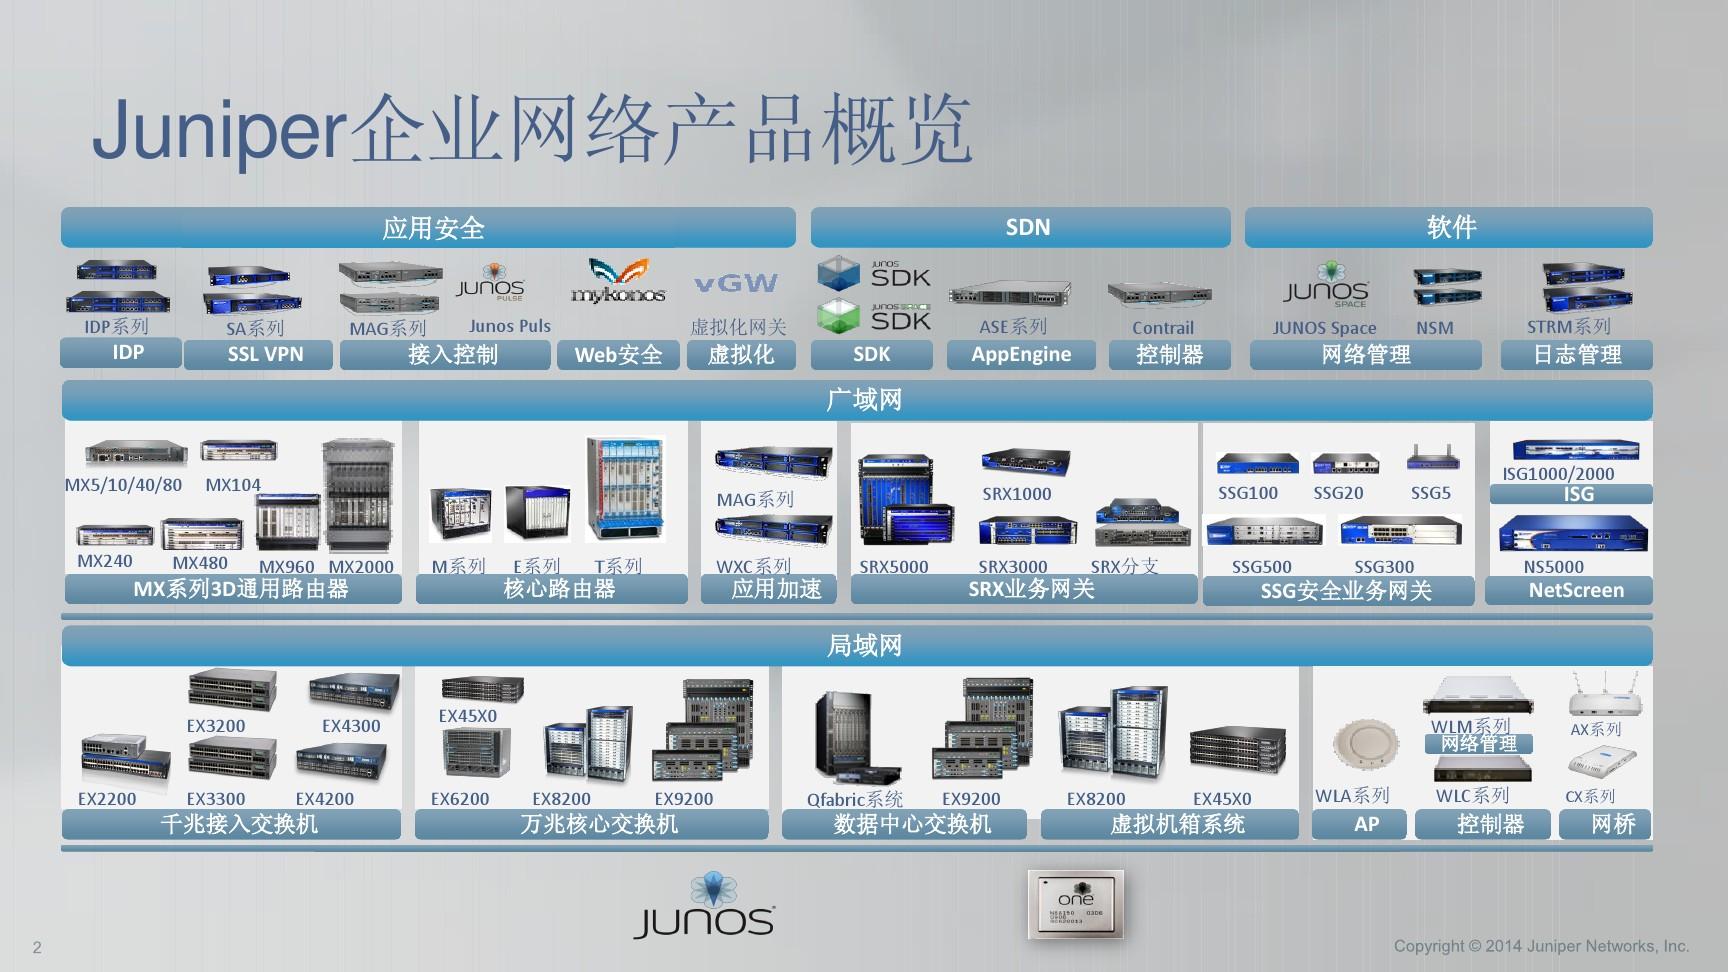 Juniper产品简单介绍_图文_百度文库